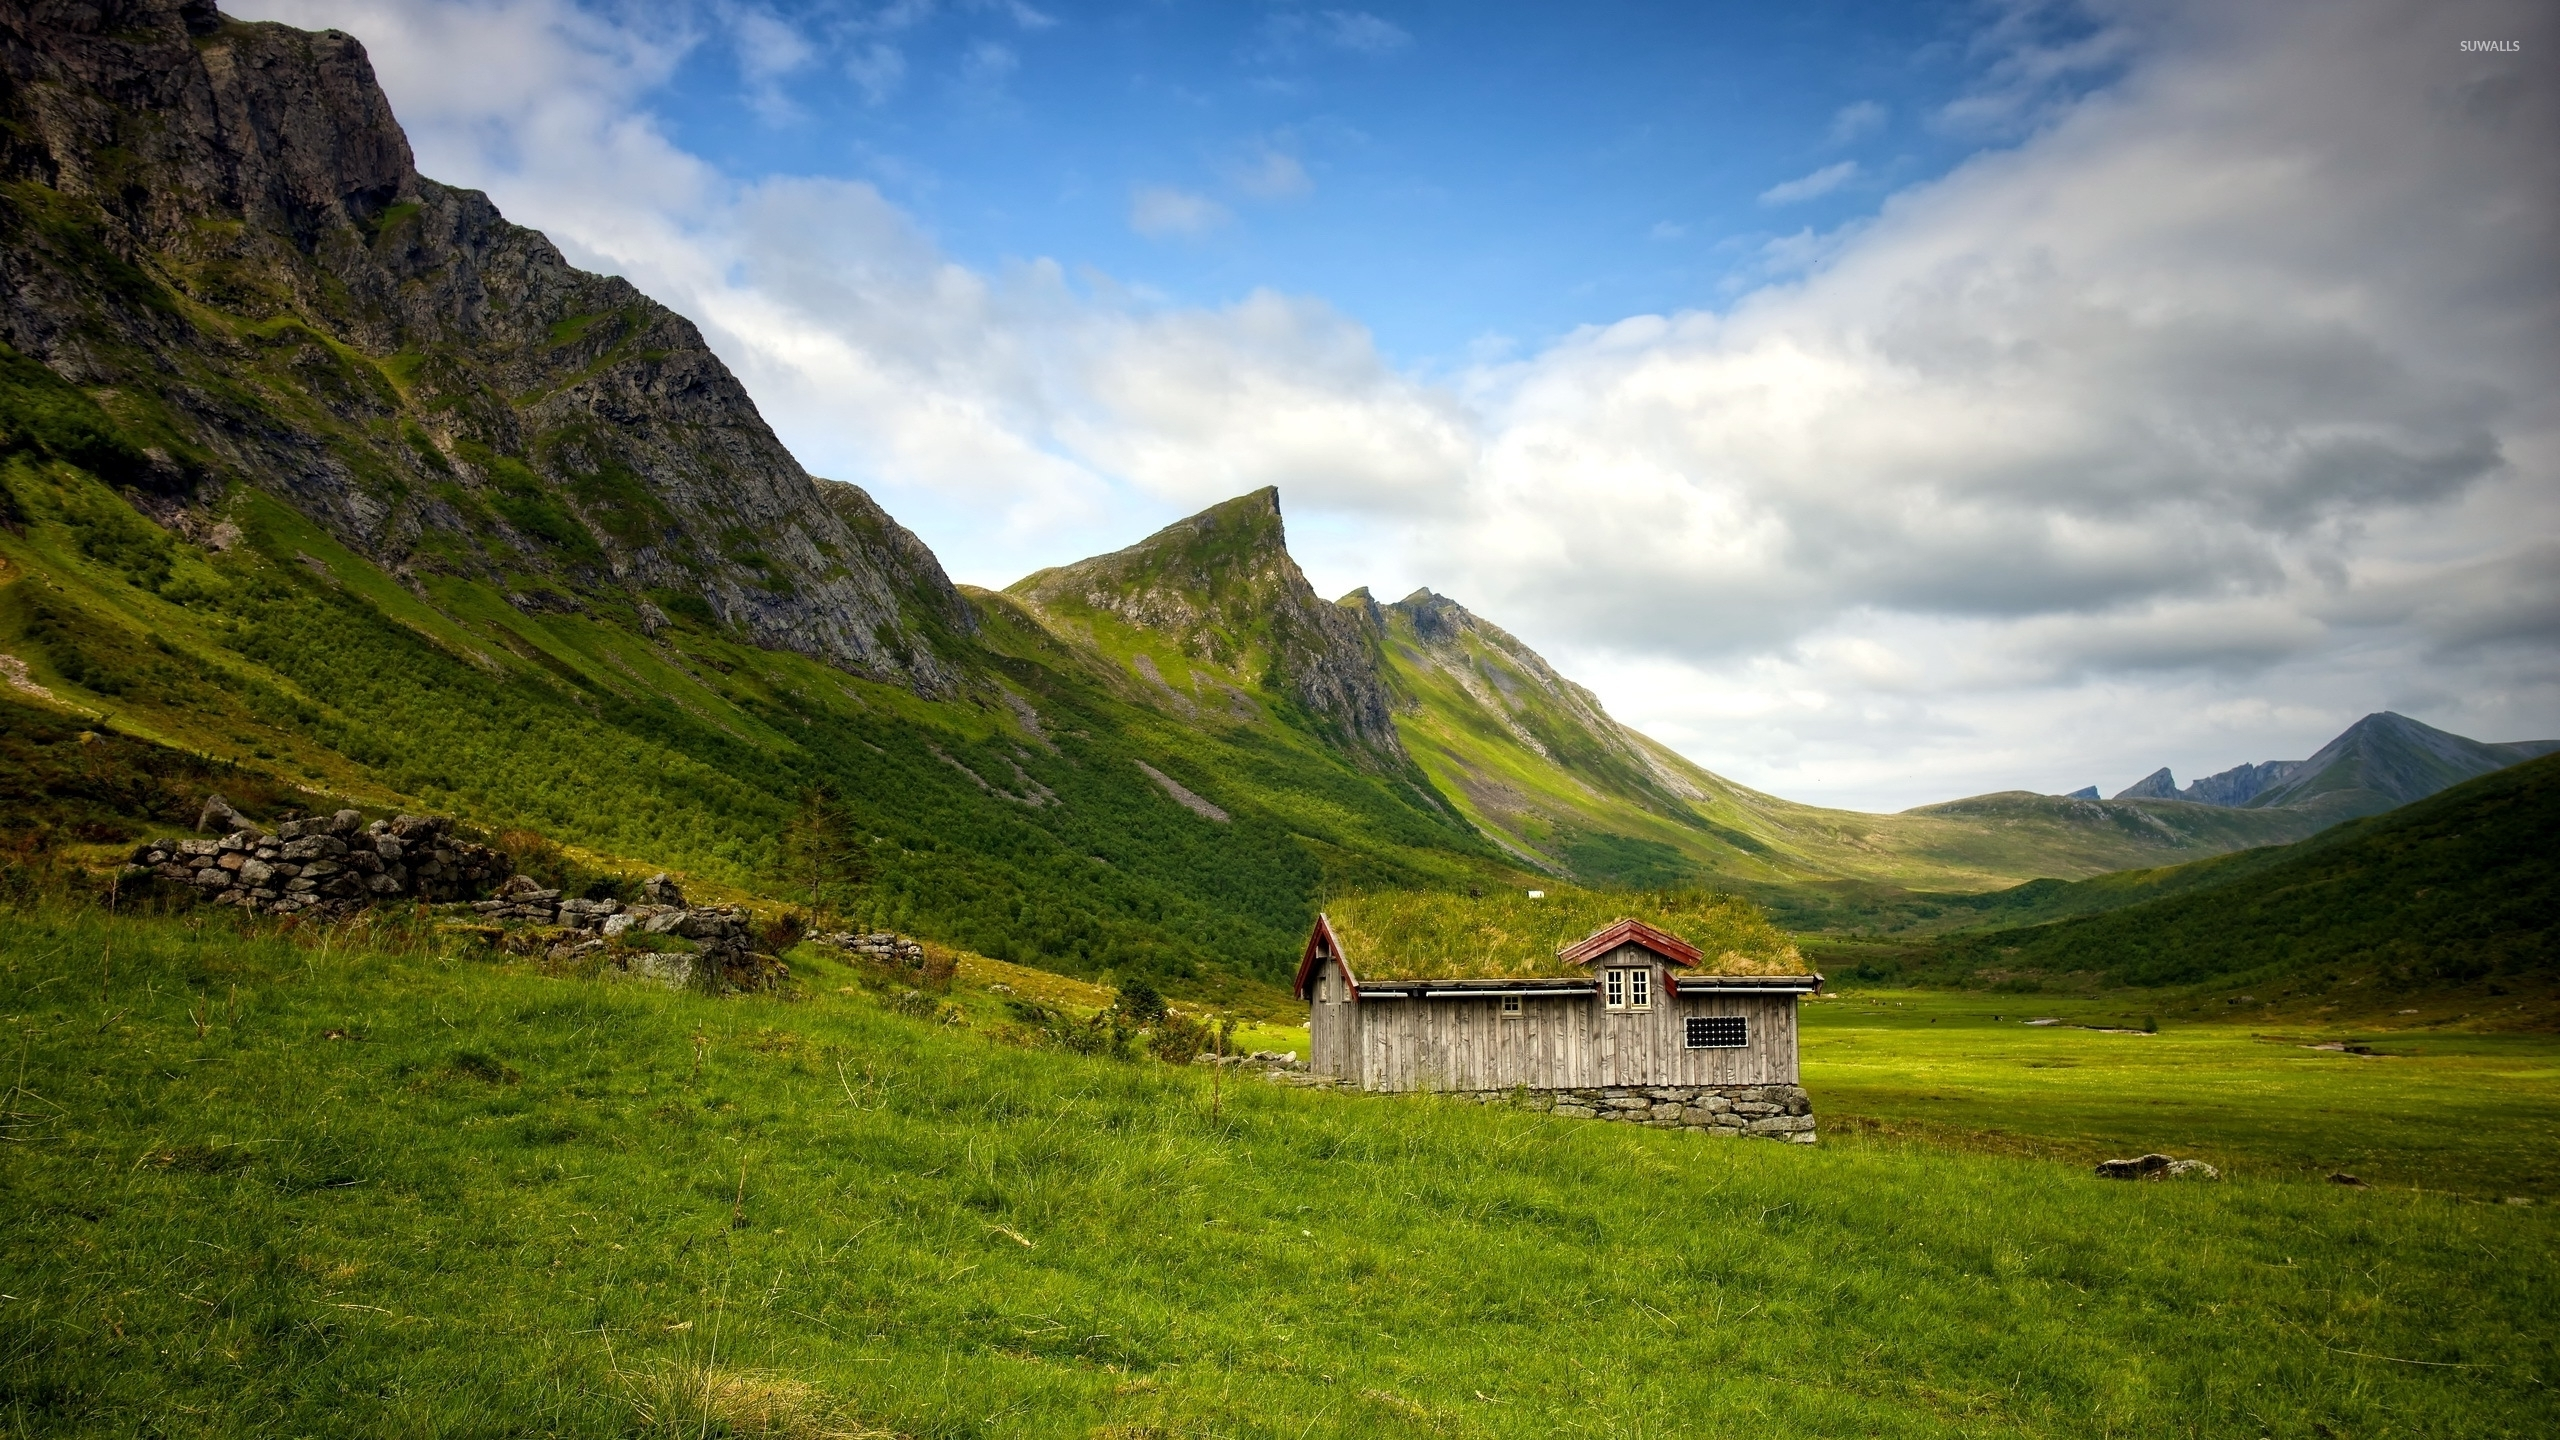 nature mountain rocky - photo #20